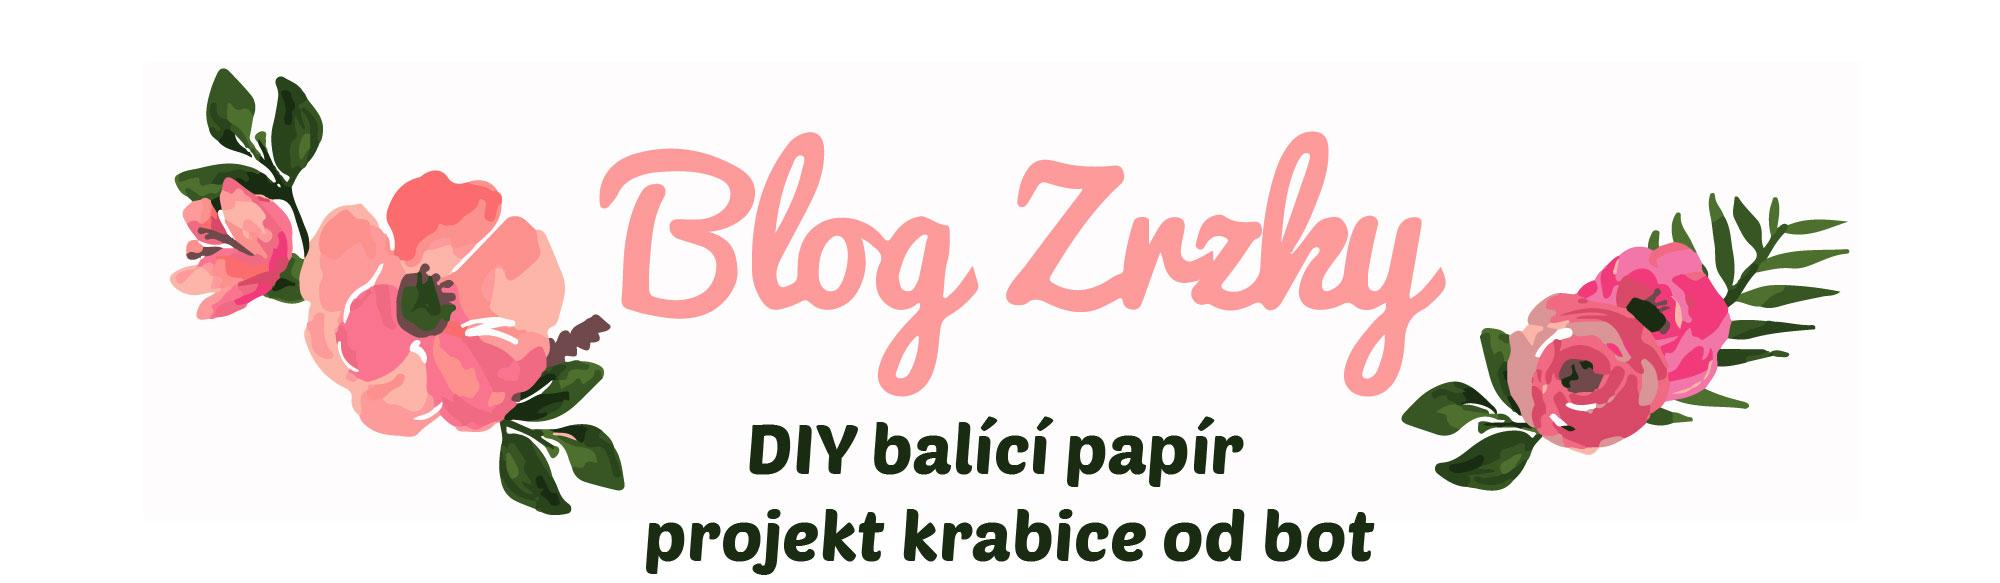 DIY_pena_balicipapir-01